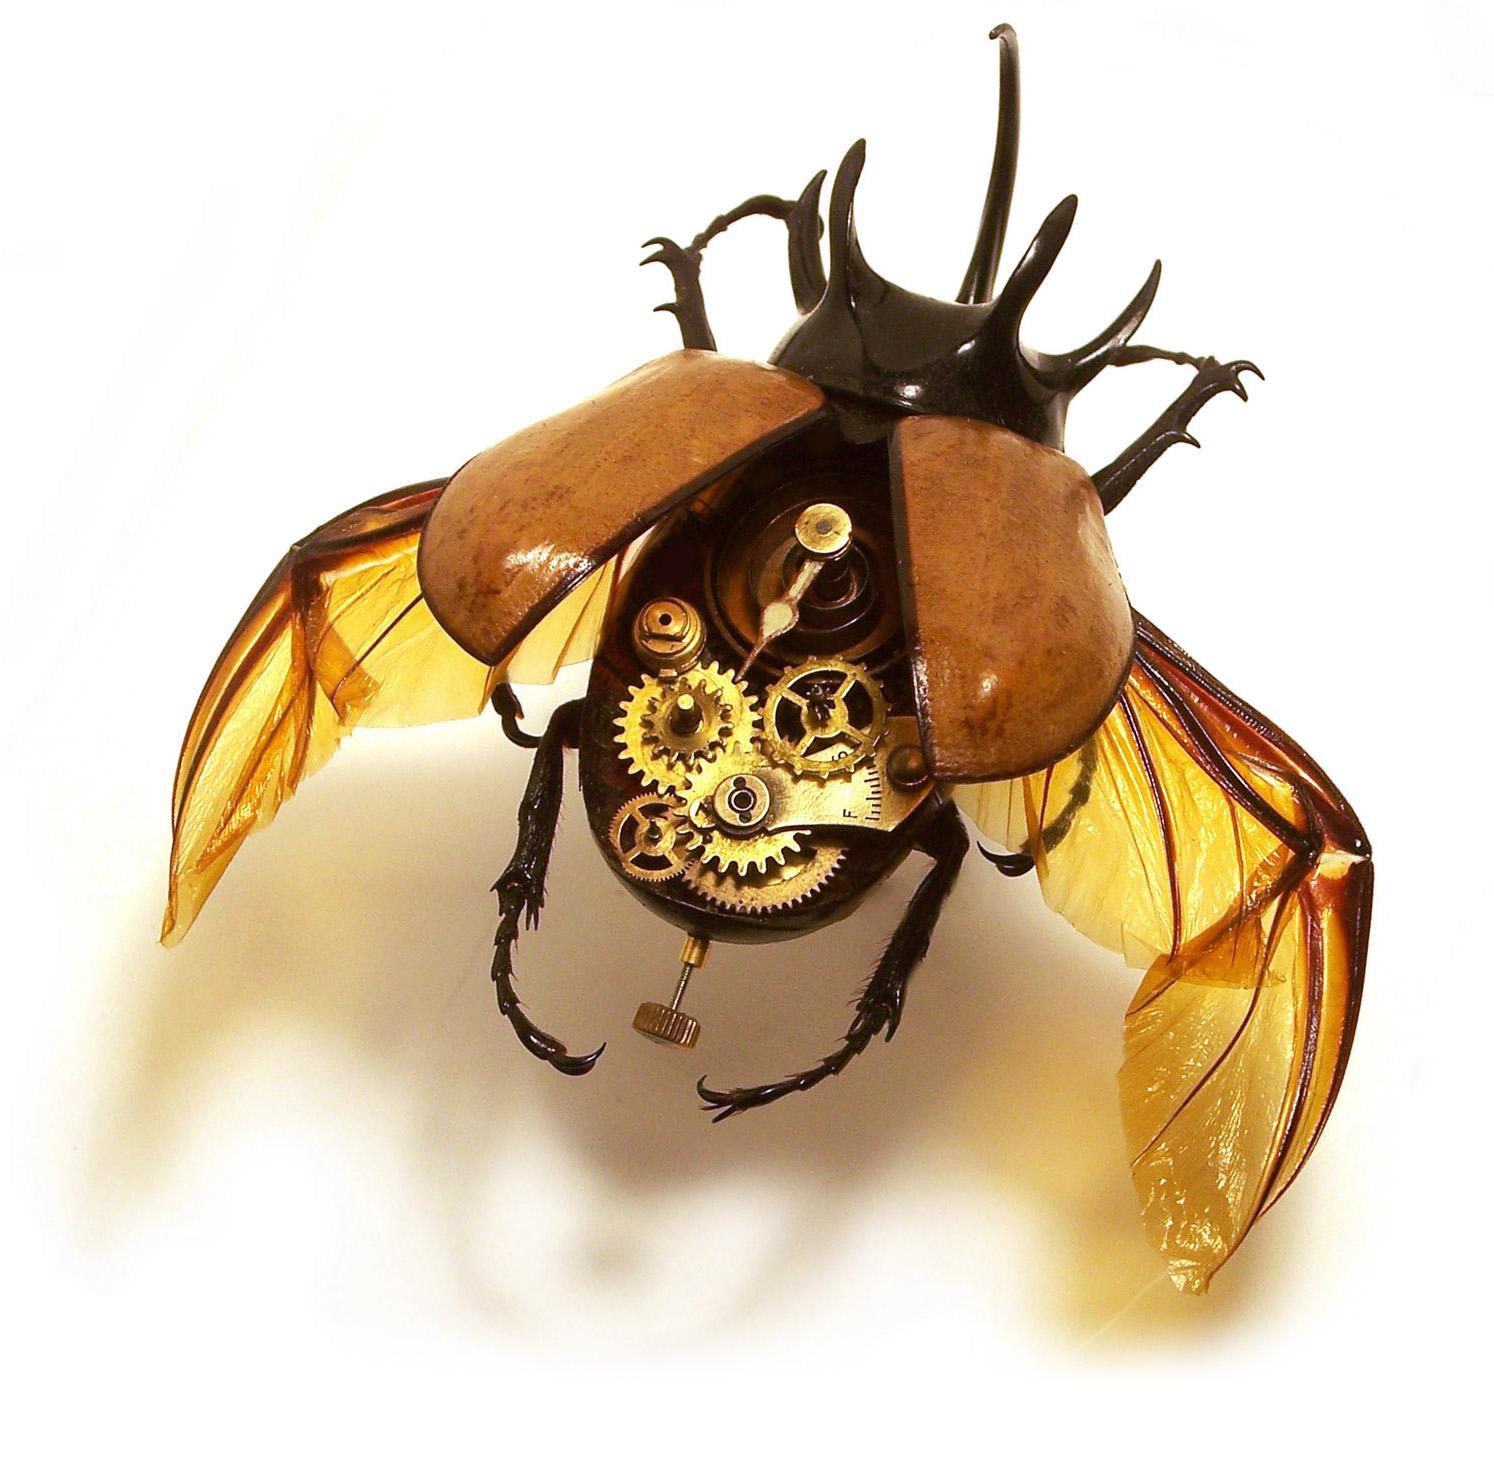 http://3.bp.blogspot.com/-fPCZjpMf7Mg/TTrk91PoLYI/AAAAAAAAACM/bONdyvBajpI/s1600/insect_lab_photo.jpg